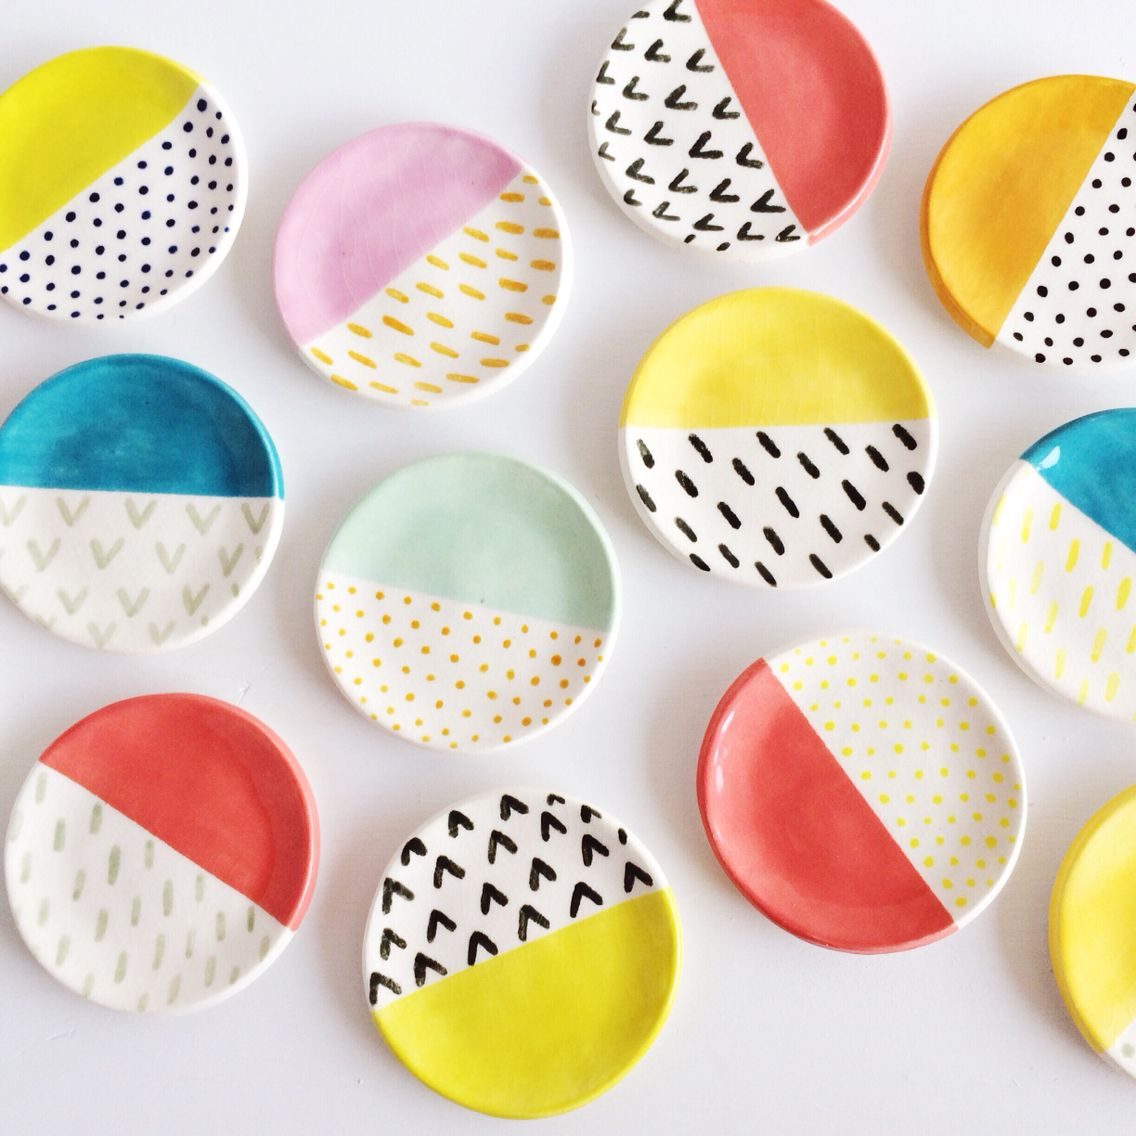 colors and patterns / quiet clementine More  sc 1 st  Pinterest & colors and patterns / quiet clementine u2026 | Ceramicsu2026